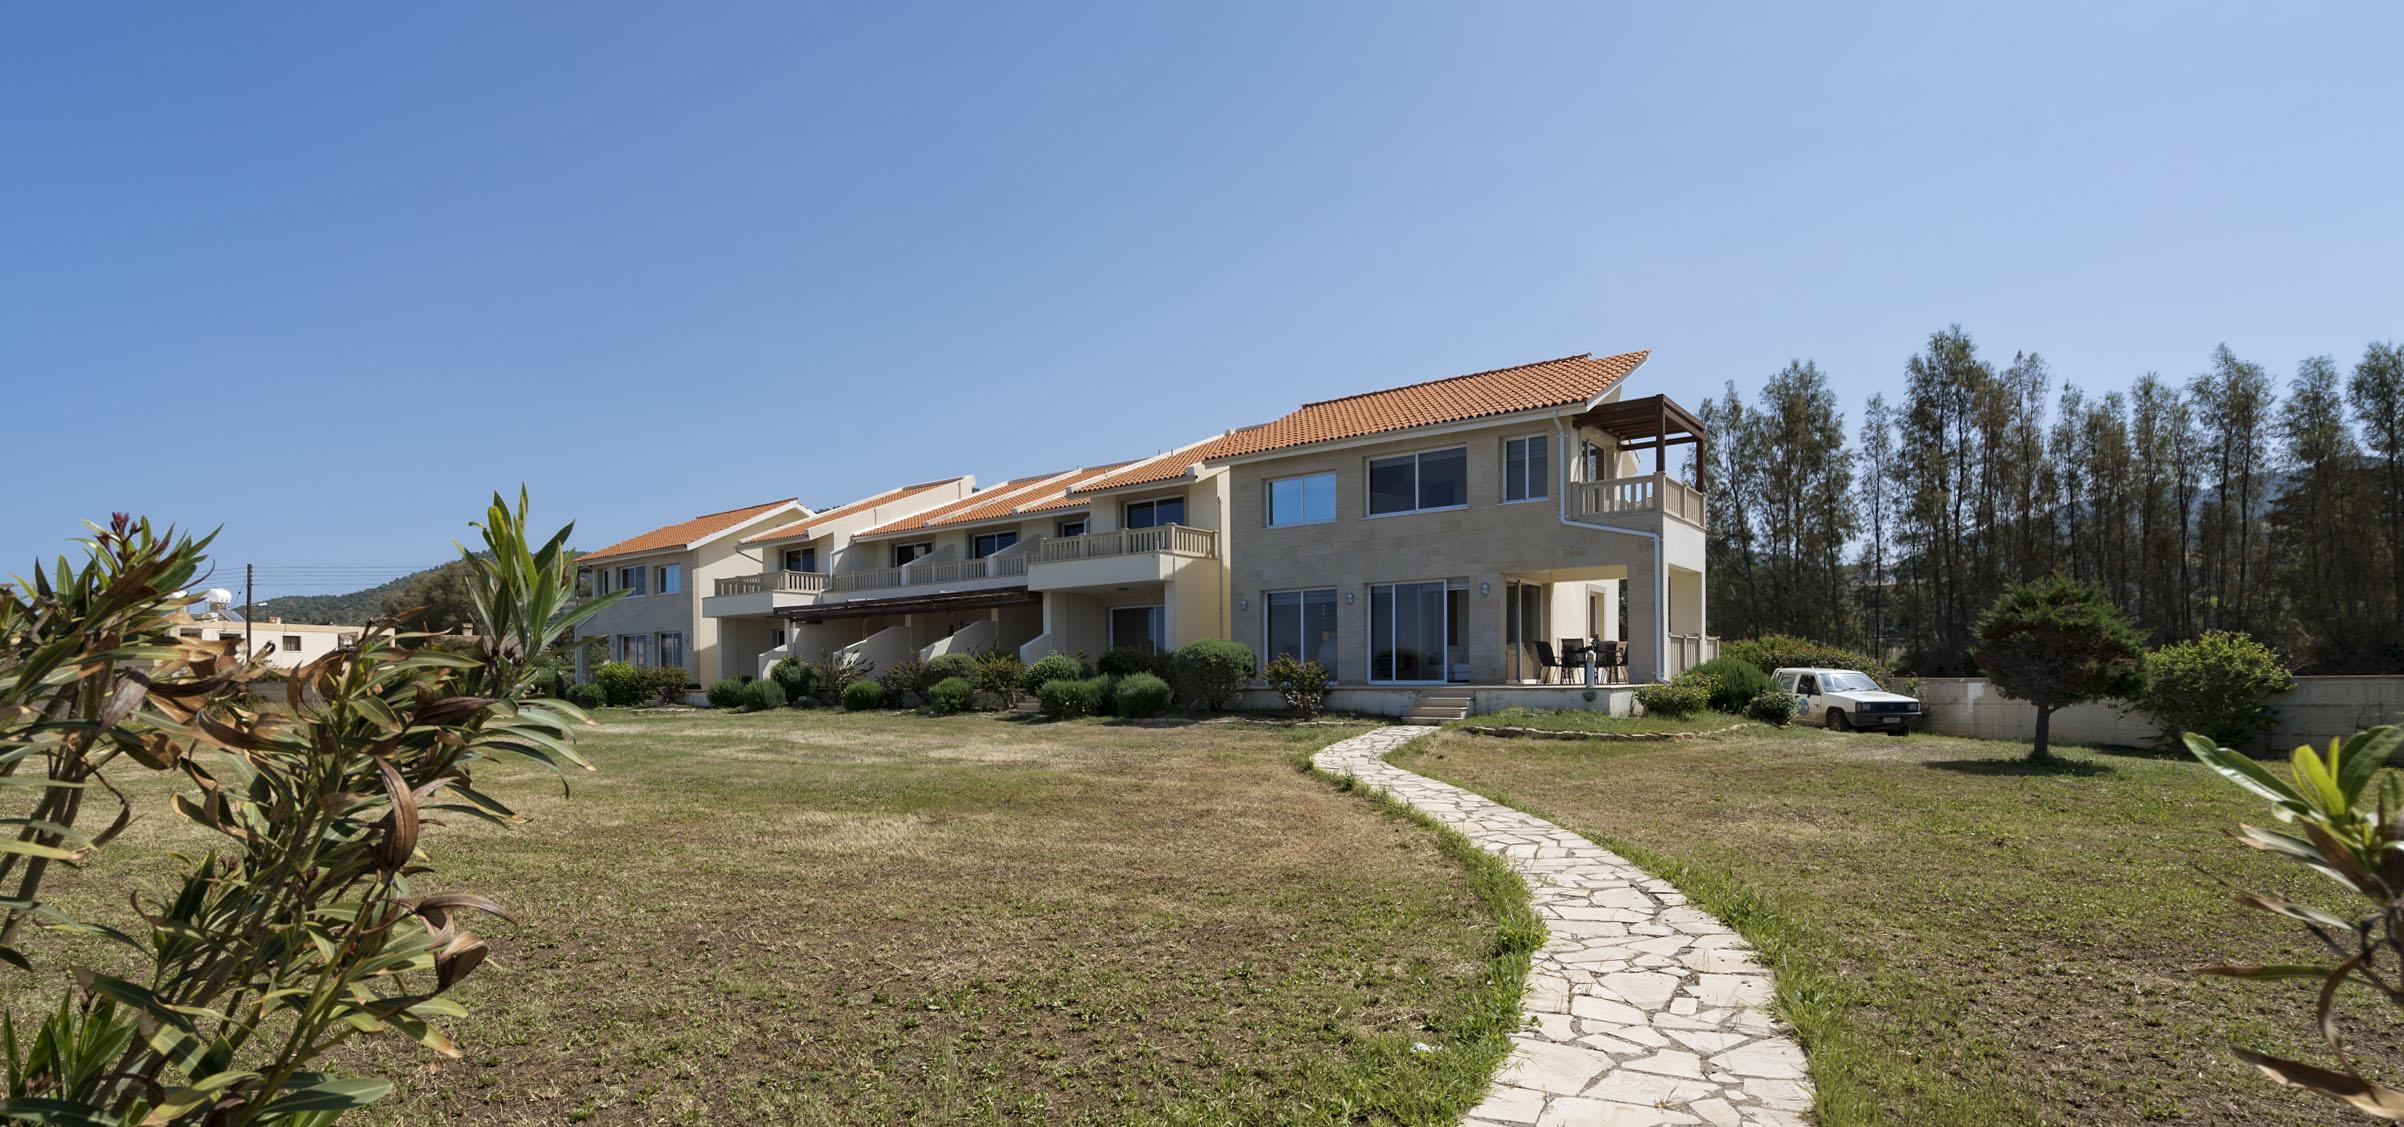 Cyprus Holiday Villa 533512